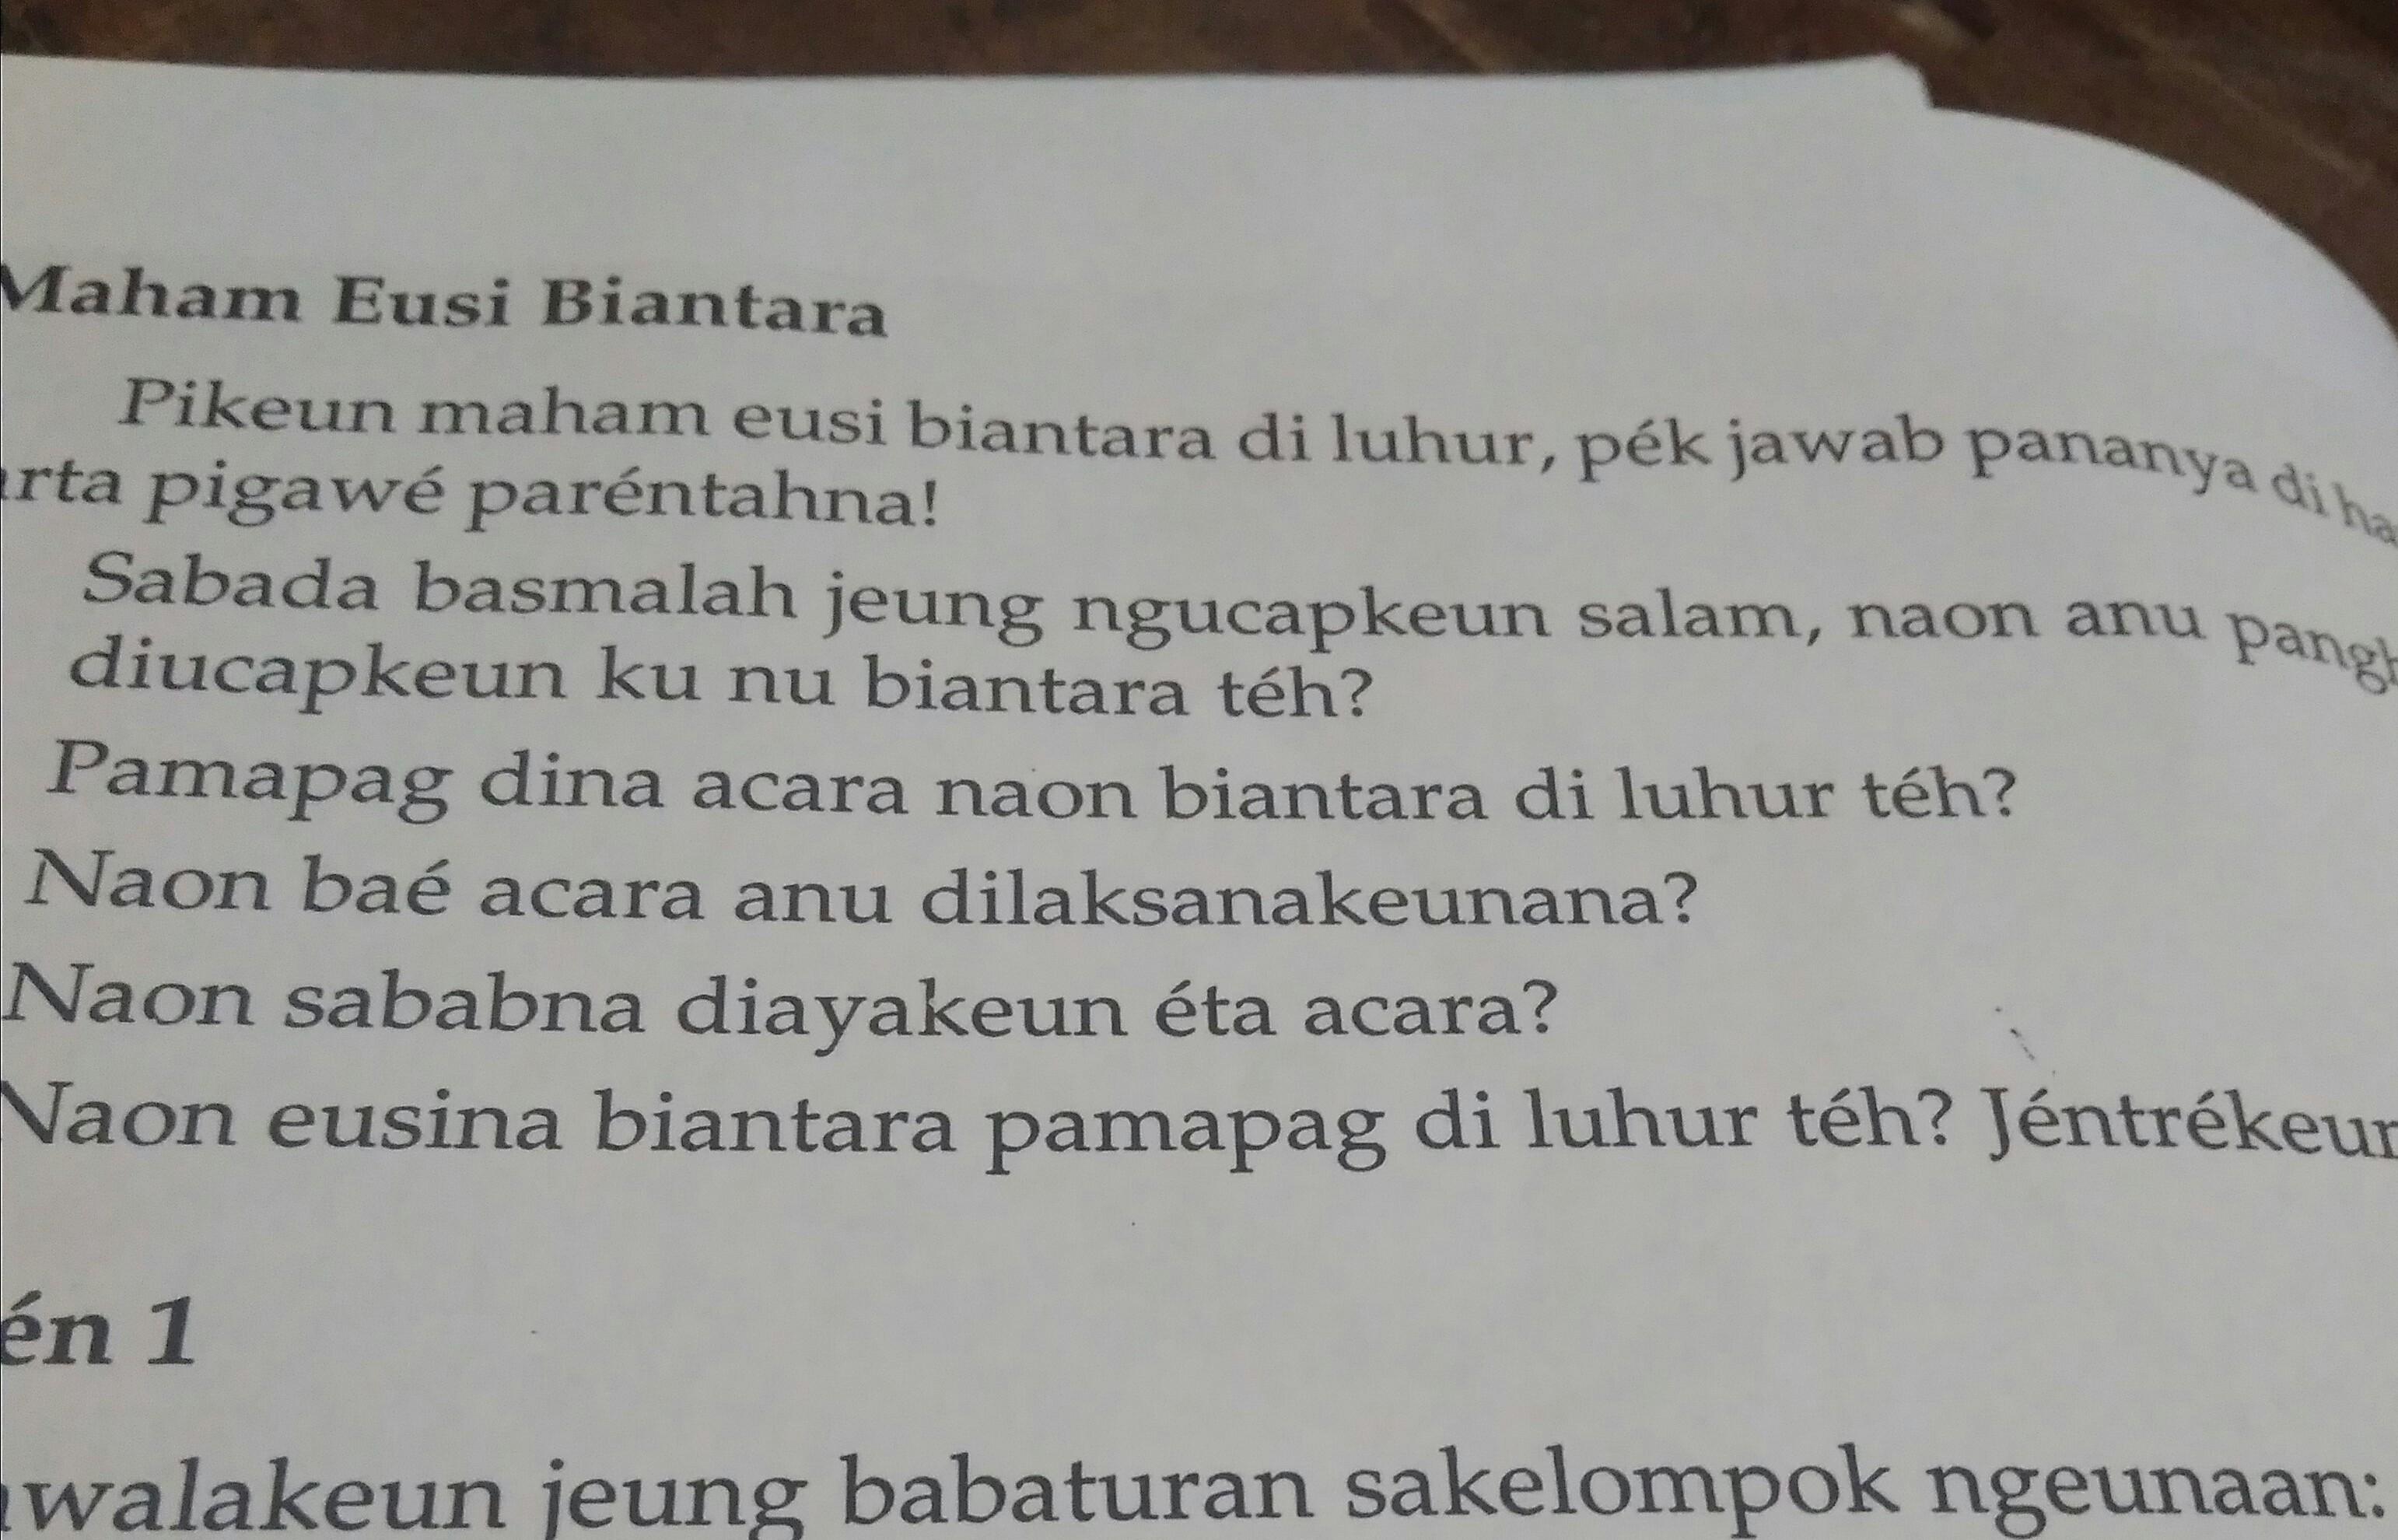 Contoh Biantara Pamapag Download Gambar Online